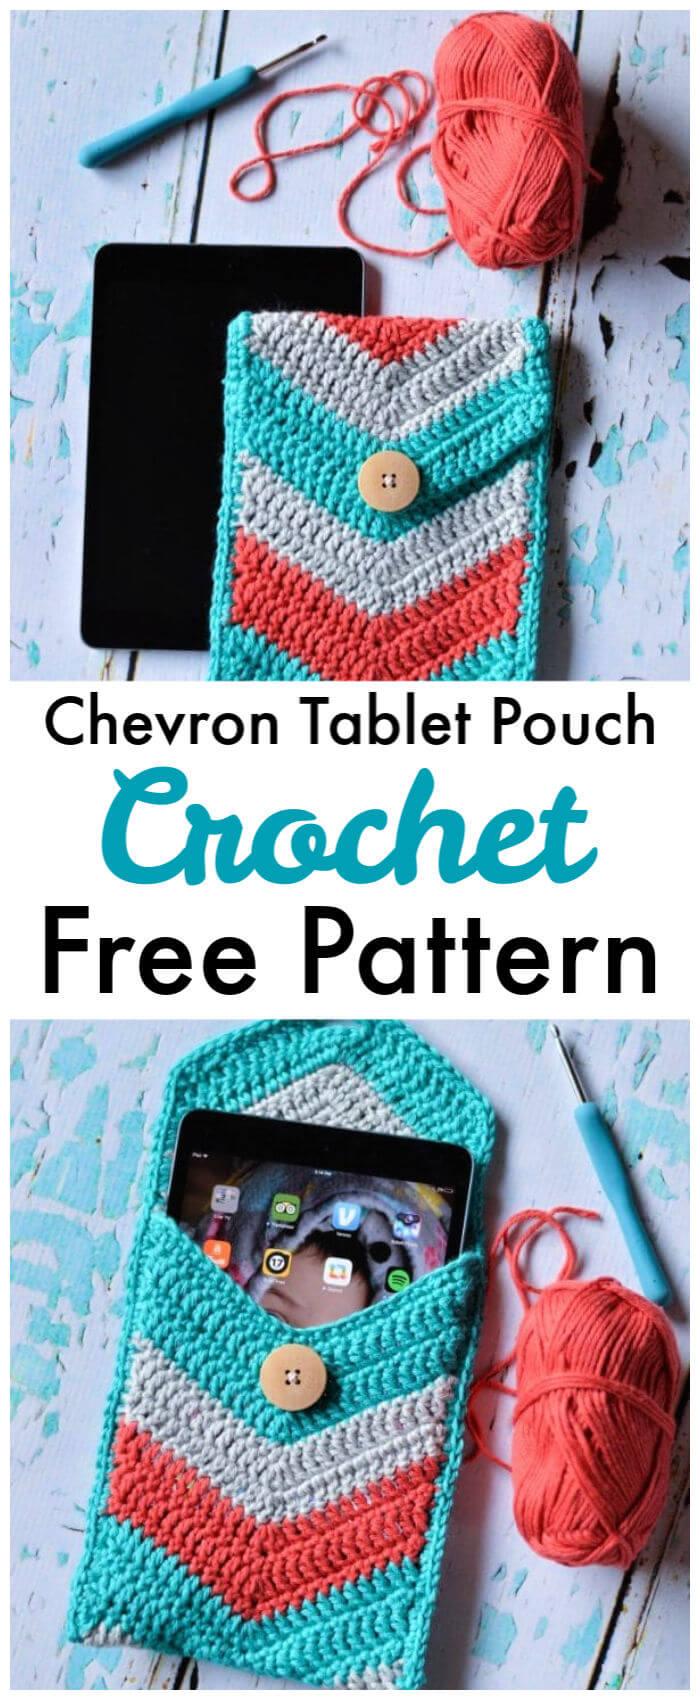 Crochet Chevron Tablet Pouch – Free Pattern